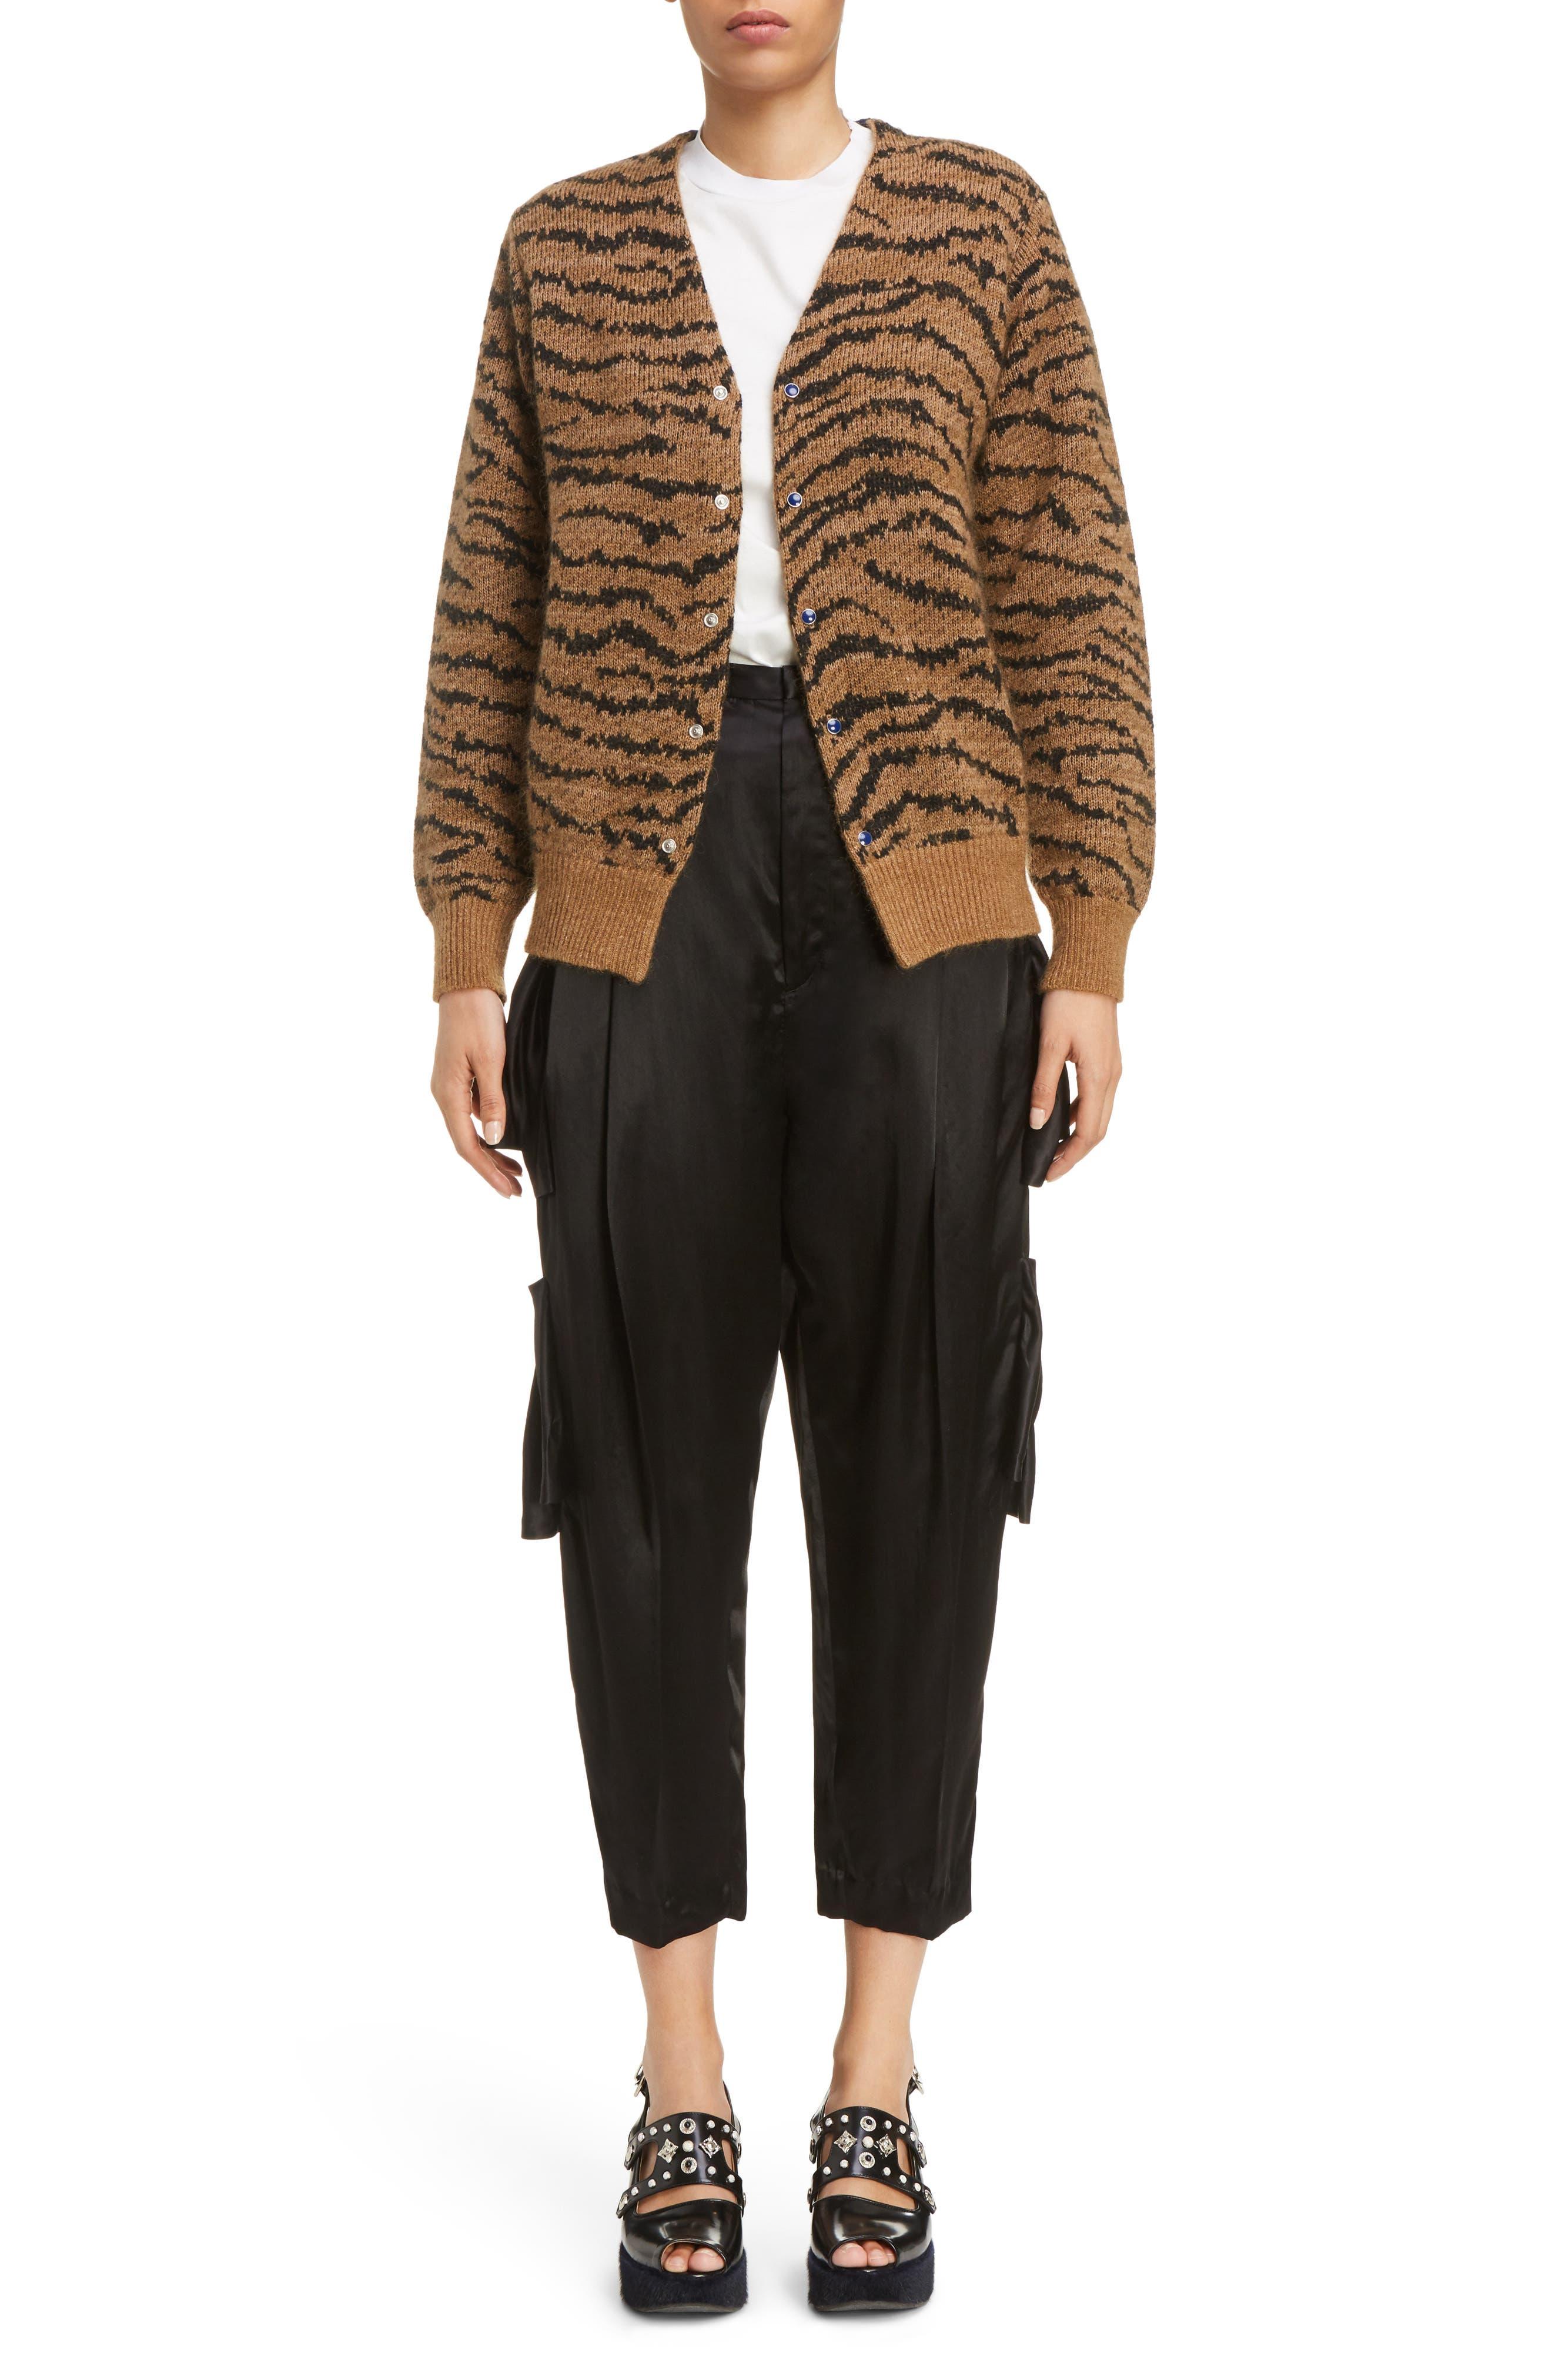 Tiger Jacquard Knit Button Cardigan,                             Alternate thumbnail 6, color,                             Beige